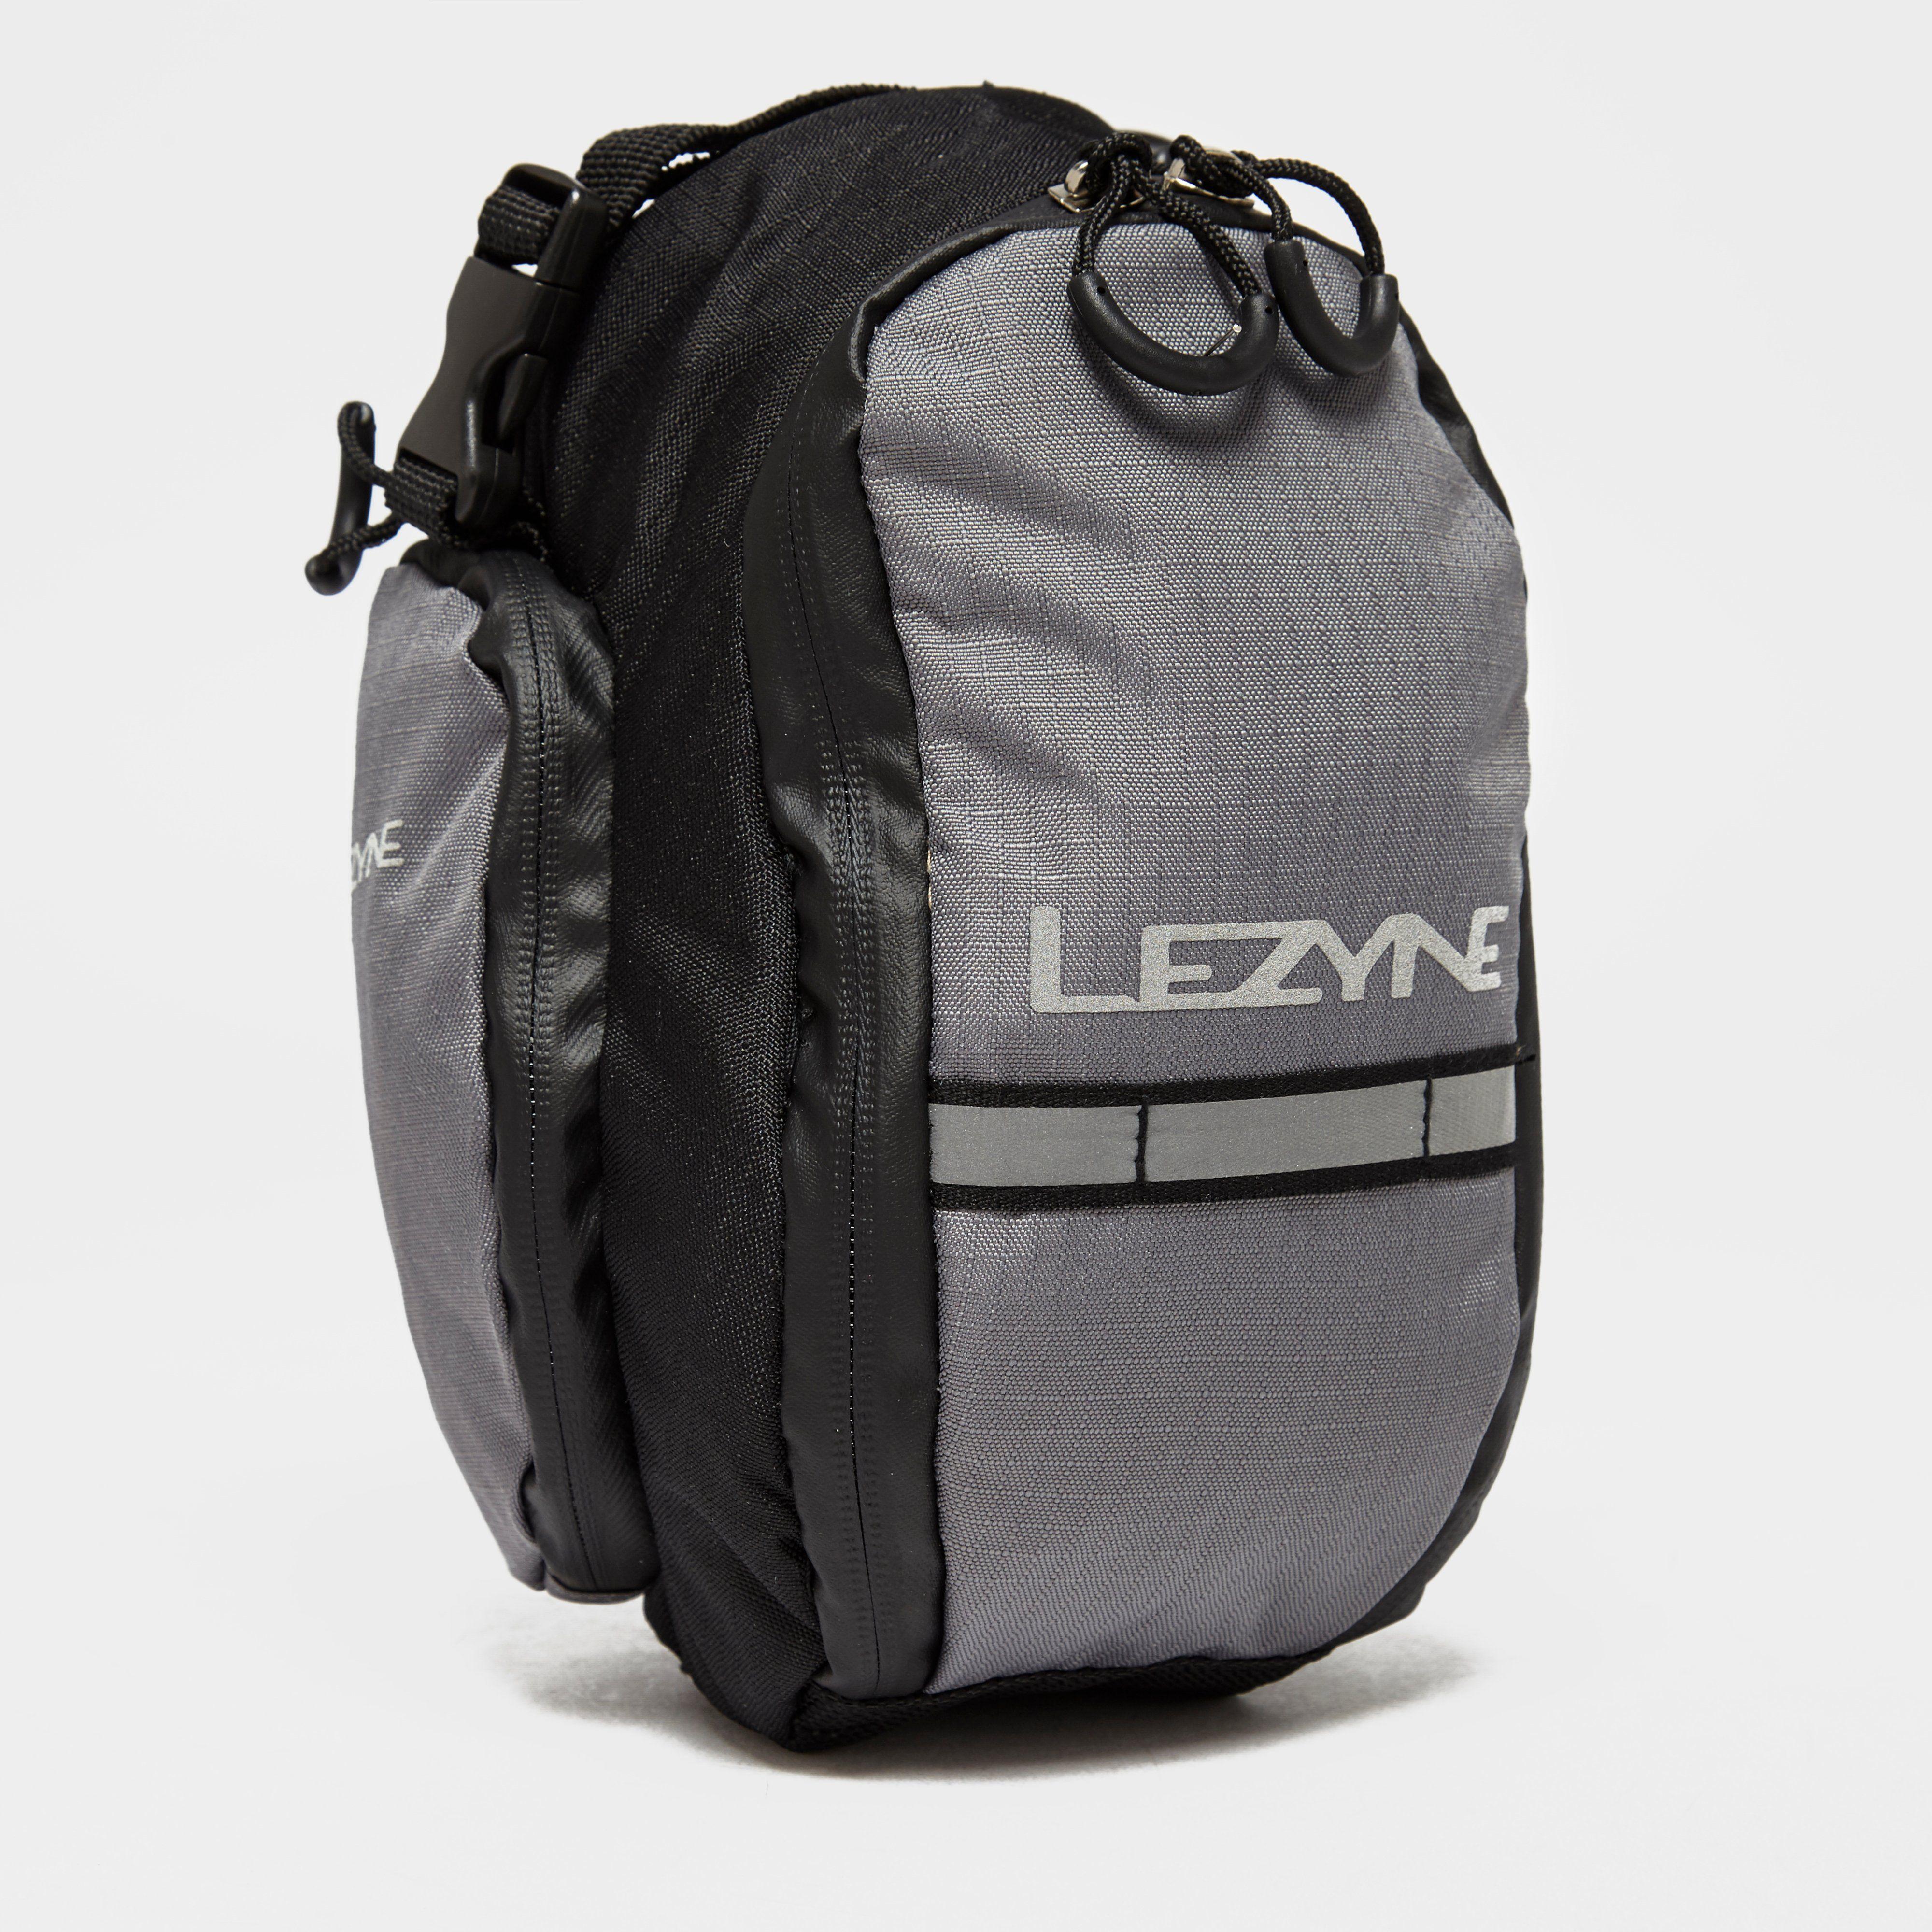 LEZYNE XL Caddy Saddle Bag